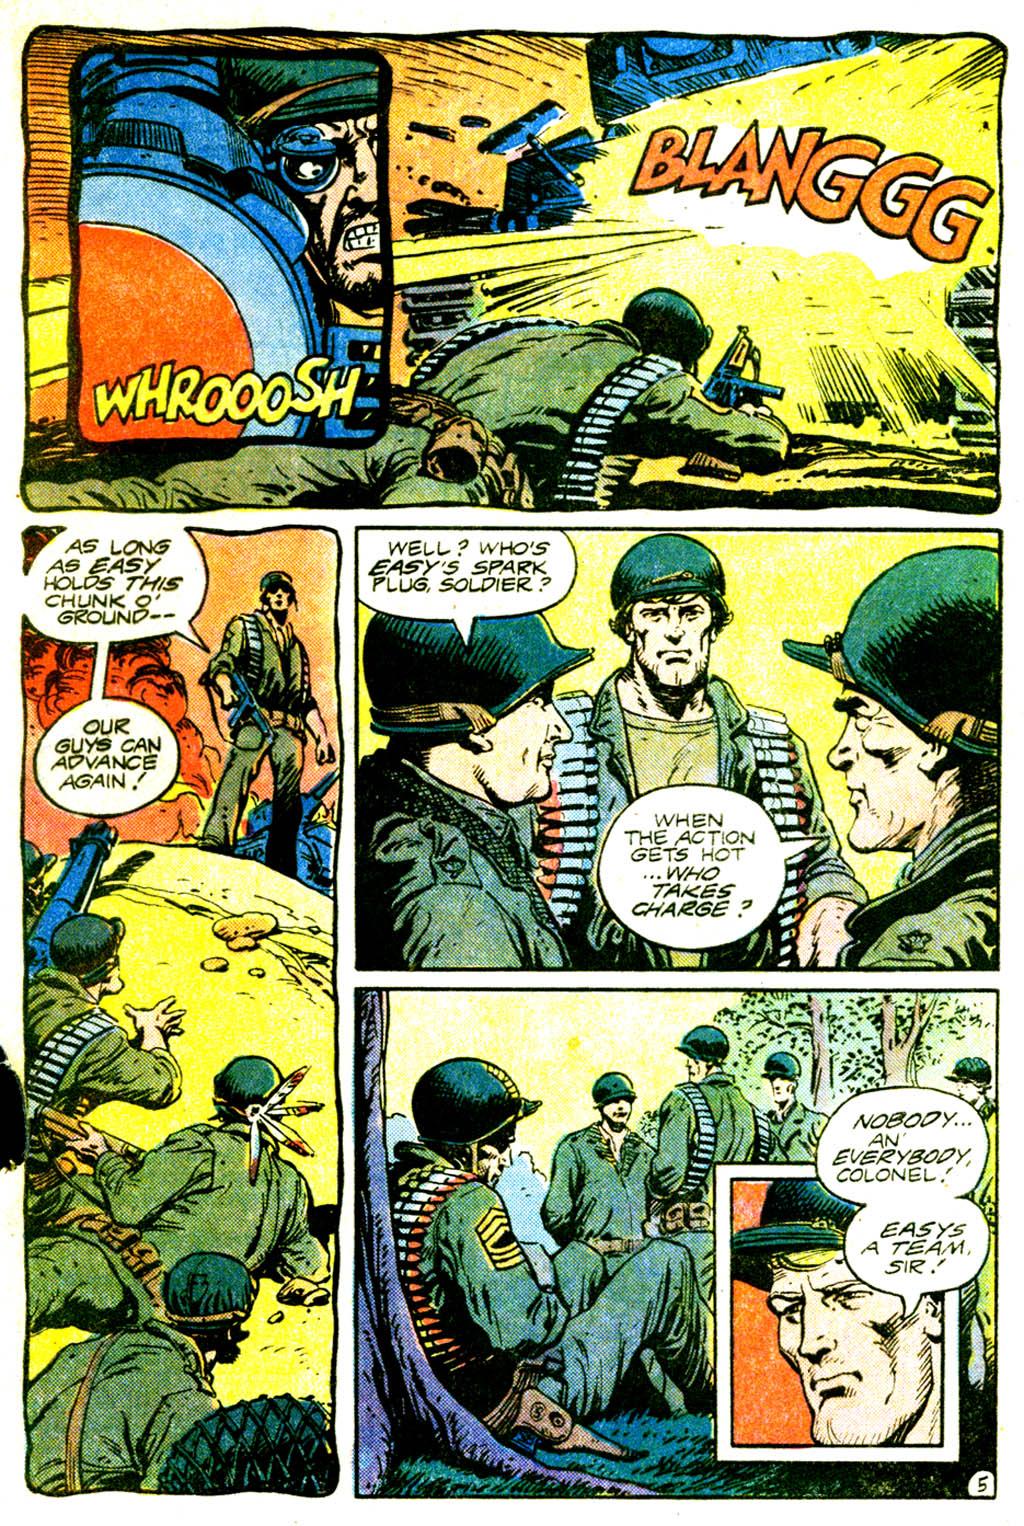 Read online Sgt. Rock comic -  Issue #362 - 7